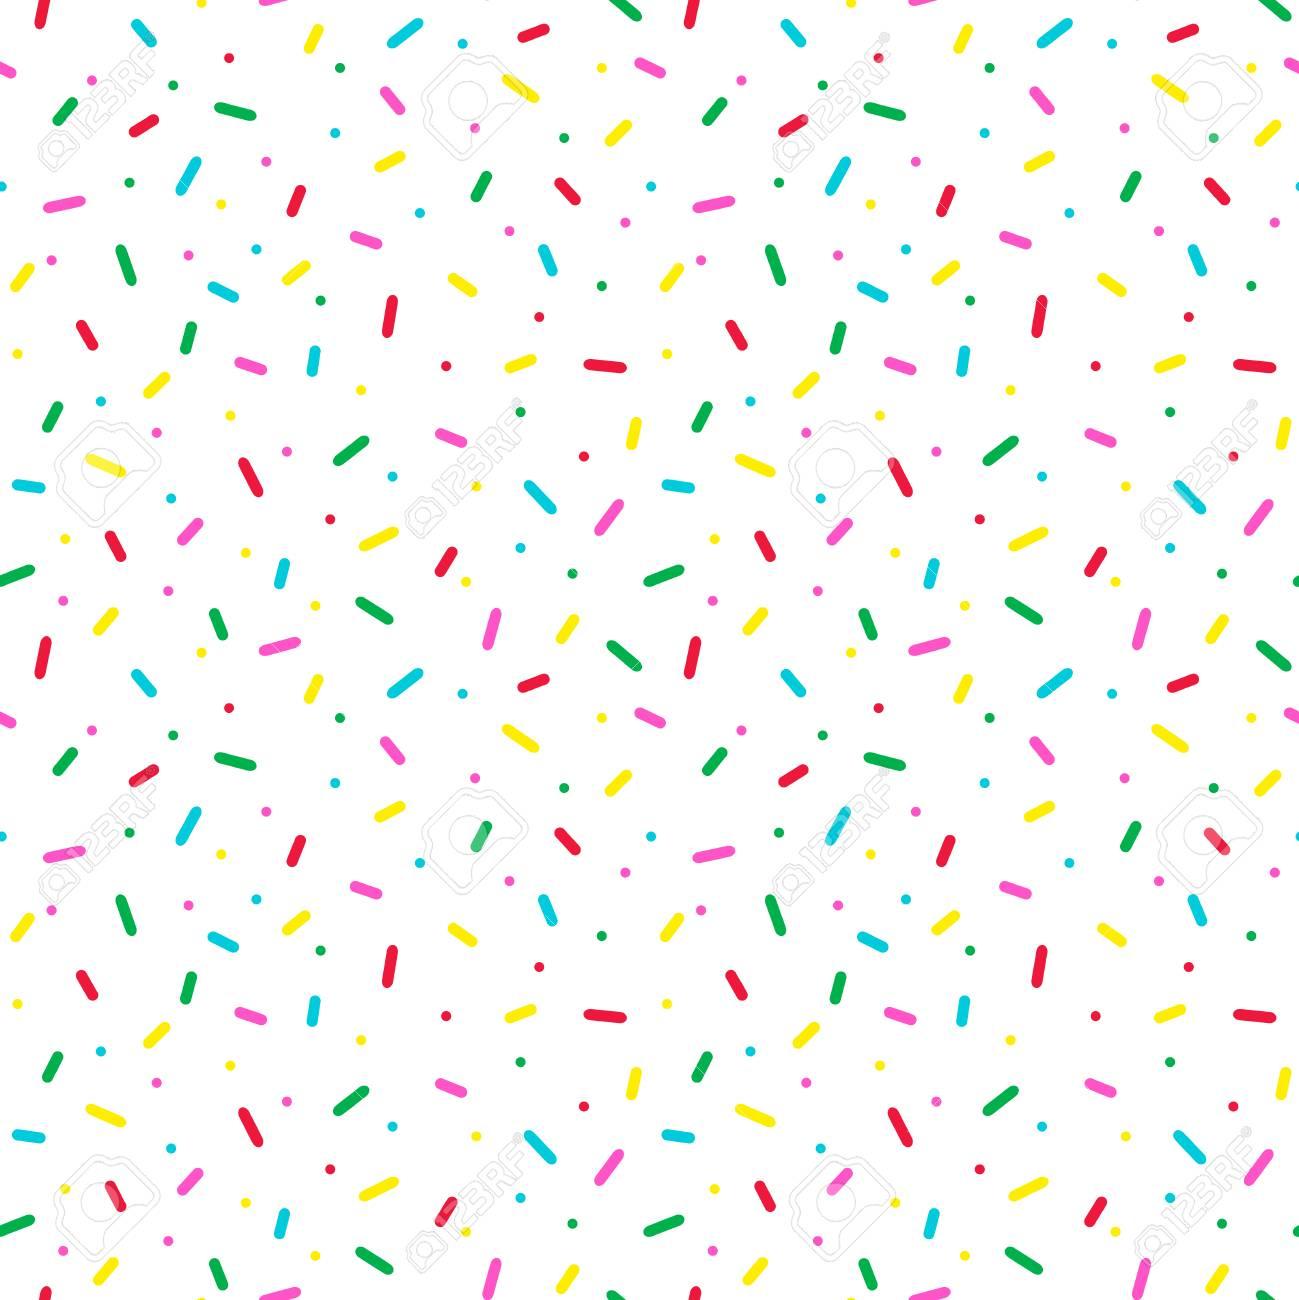 Seamless pattern with colorful sprinkles. Donut glaze background. - 96317280